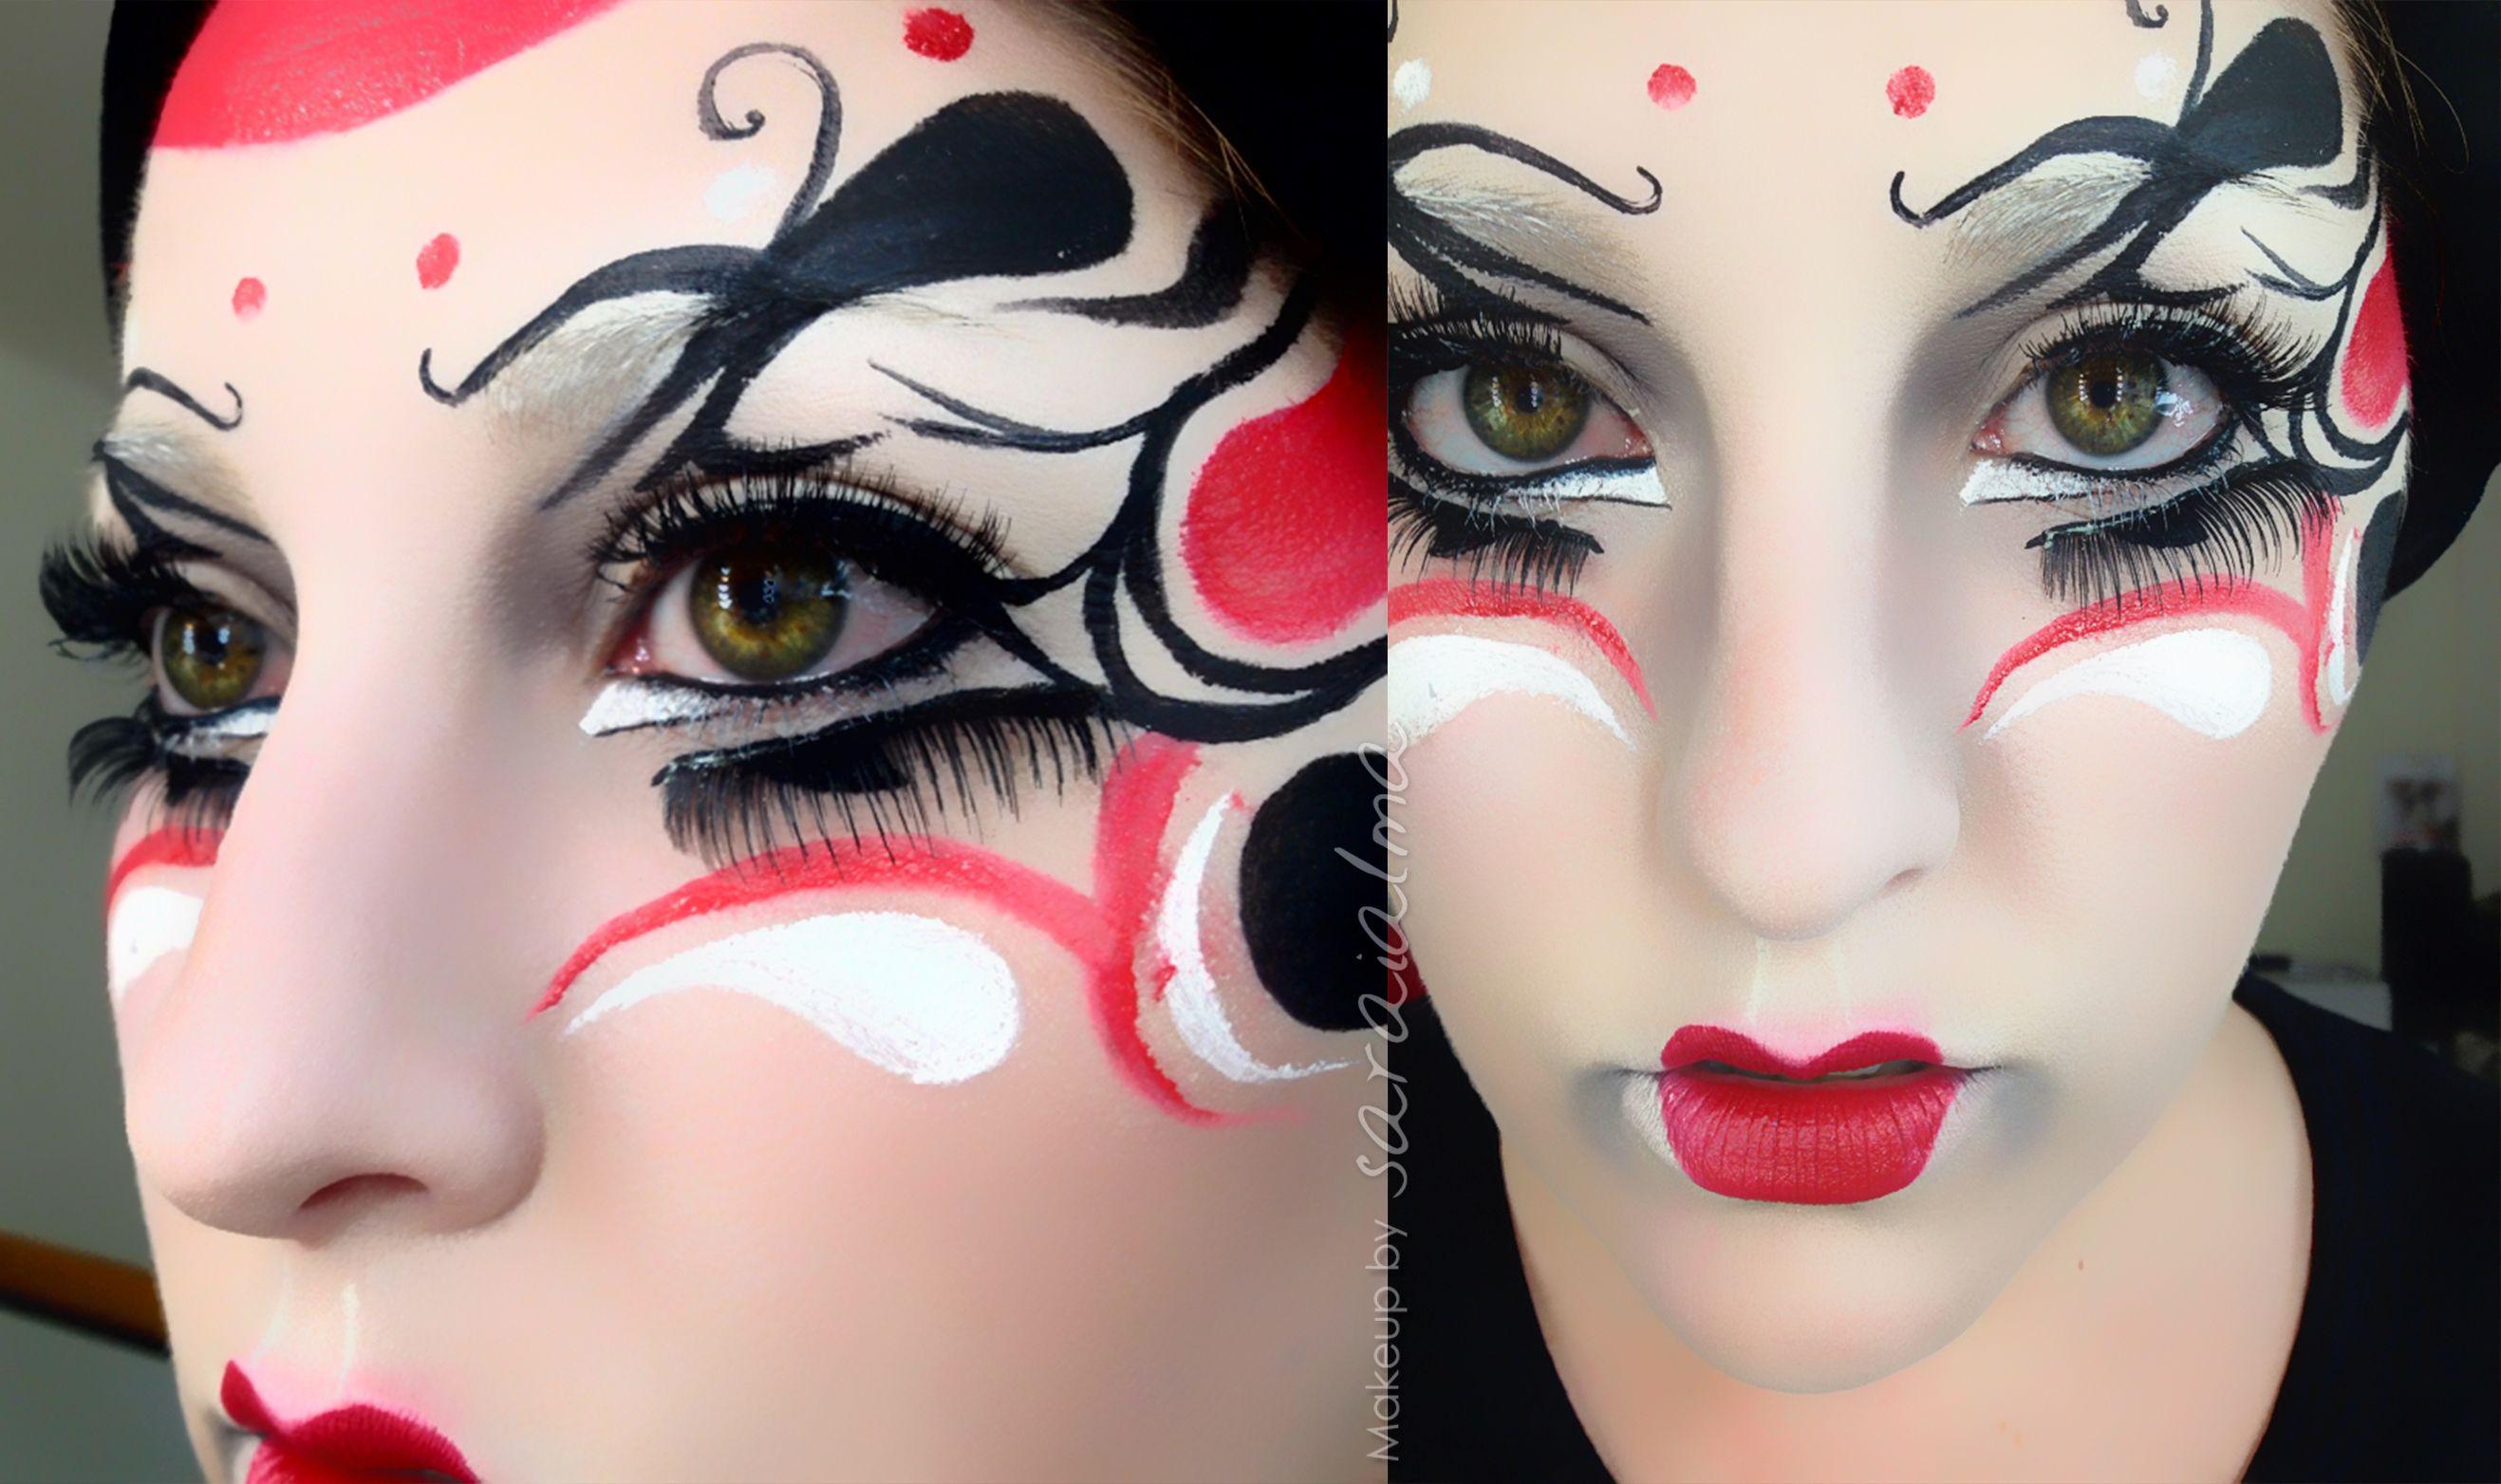 carnaval #maquillake #makeup #masquerade #mascara #fantasymakeup ...